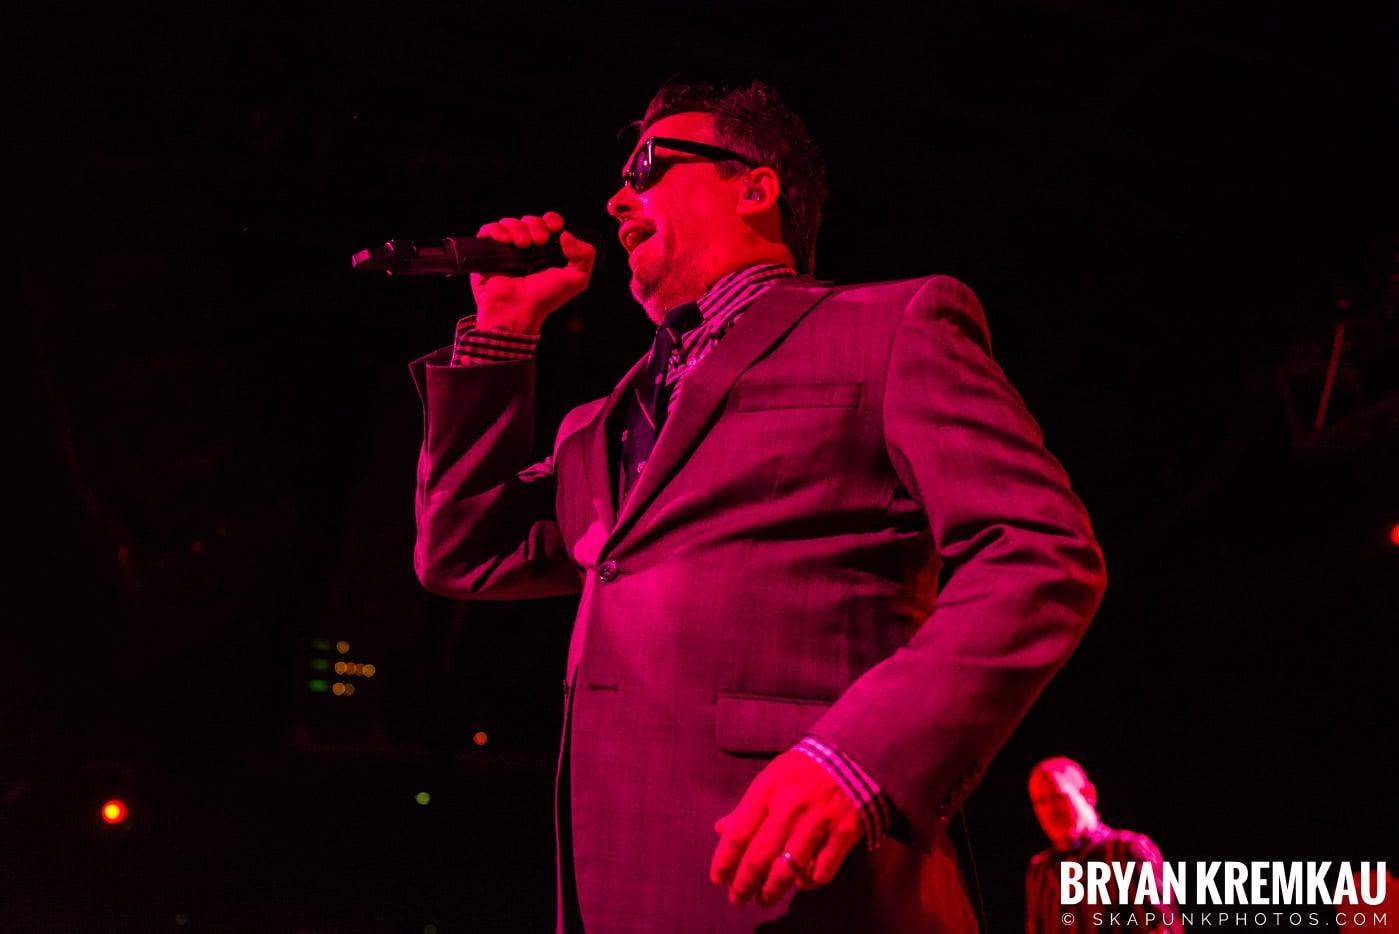 Mighty Mighty Bosstones @ Starland Ballroom, Sayreville, NJ - 7.29.17 (43)